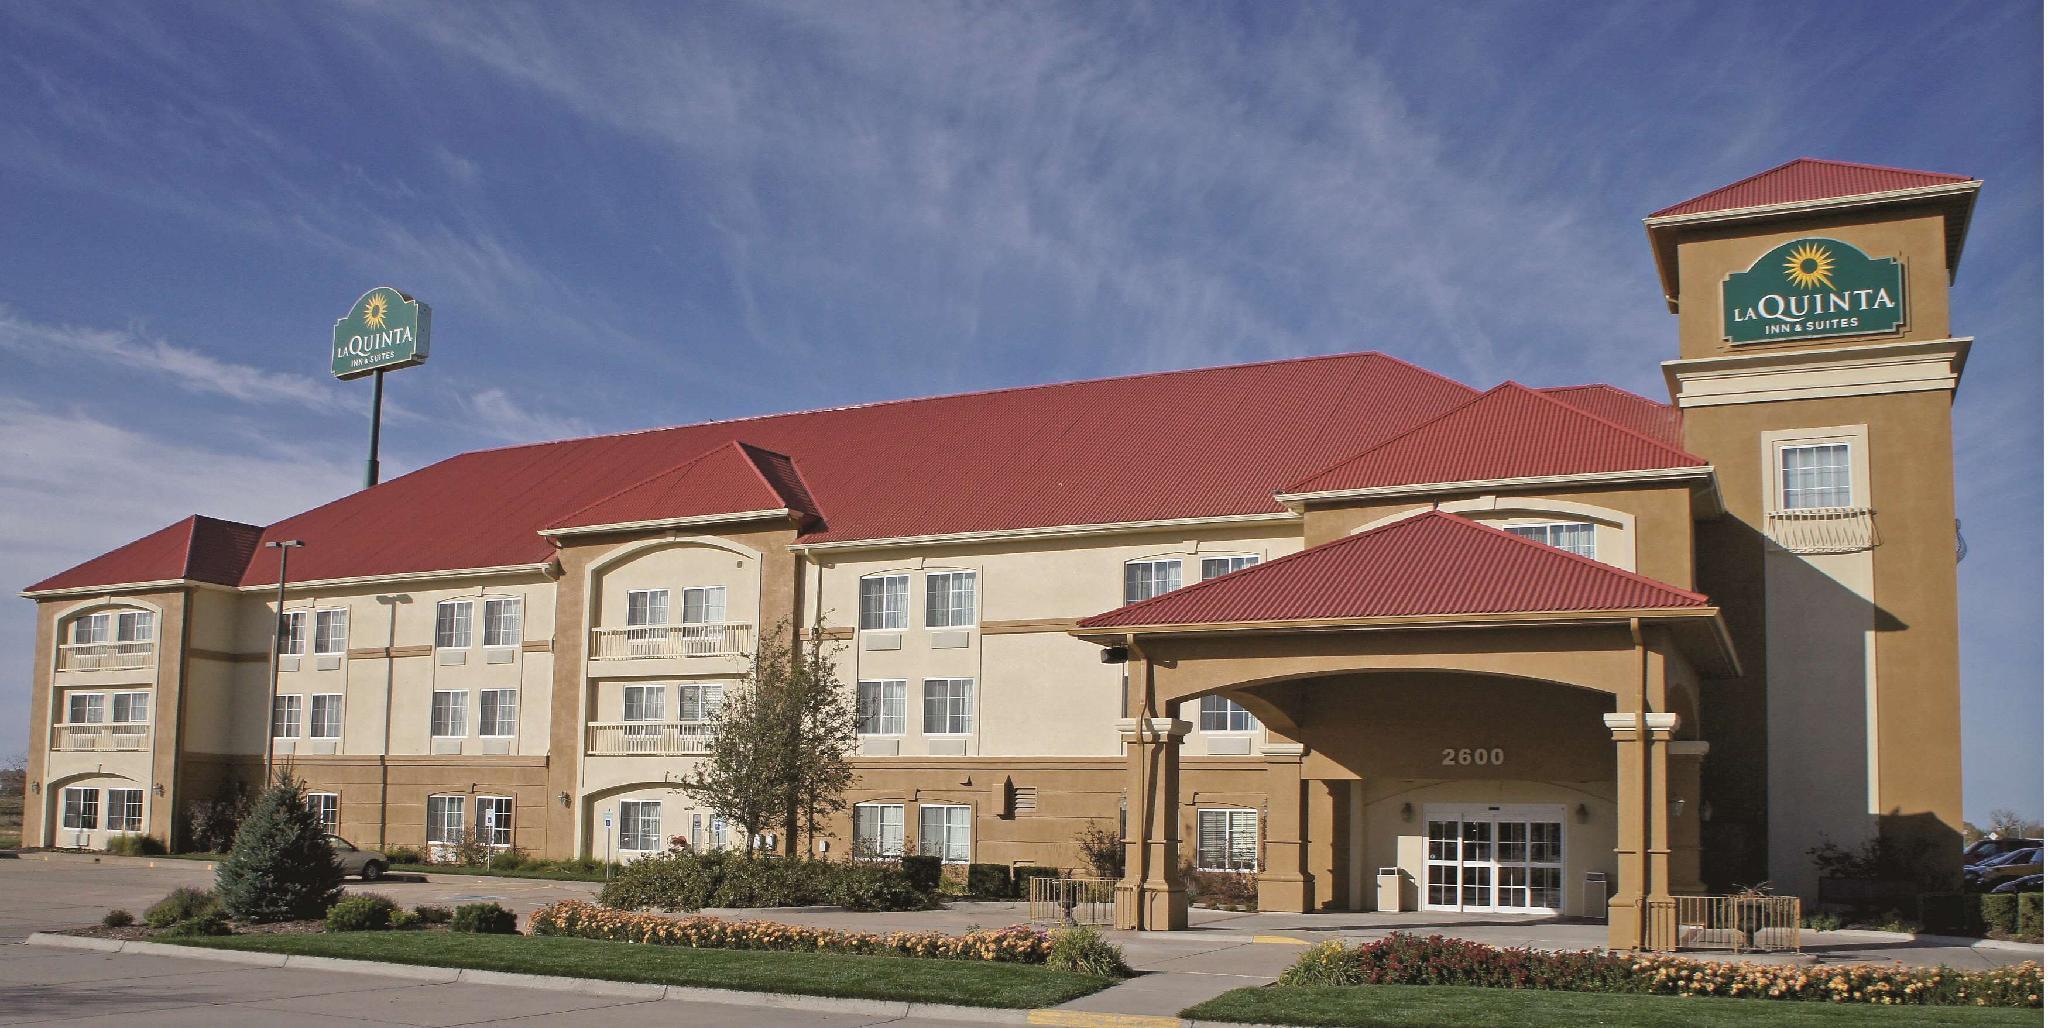 La Quinta Inn And Suites By Wyndham North Platte